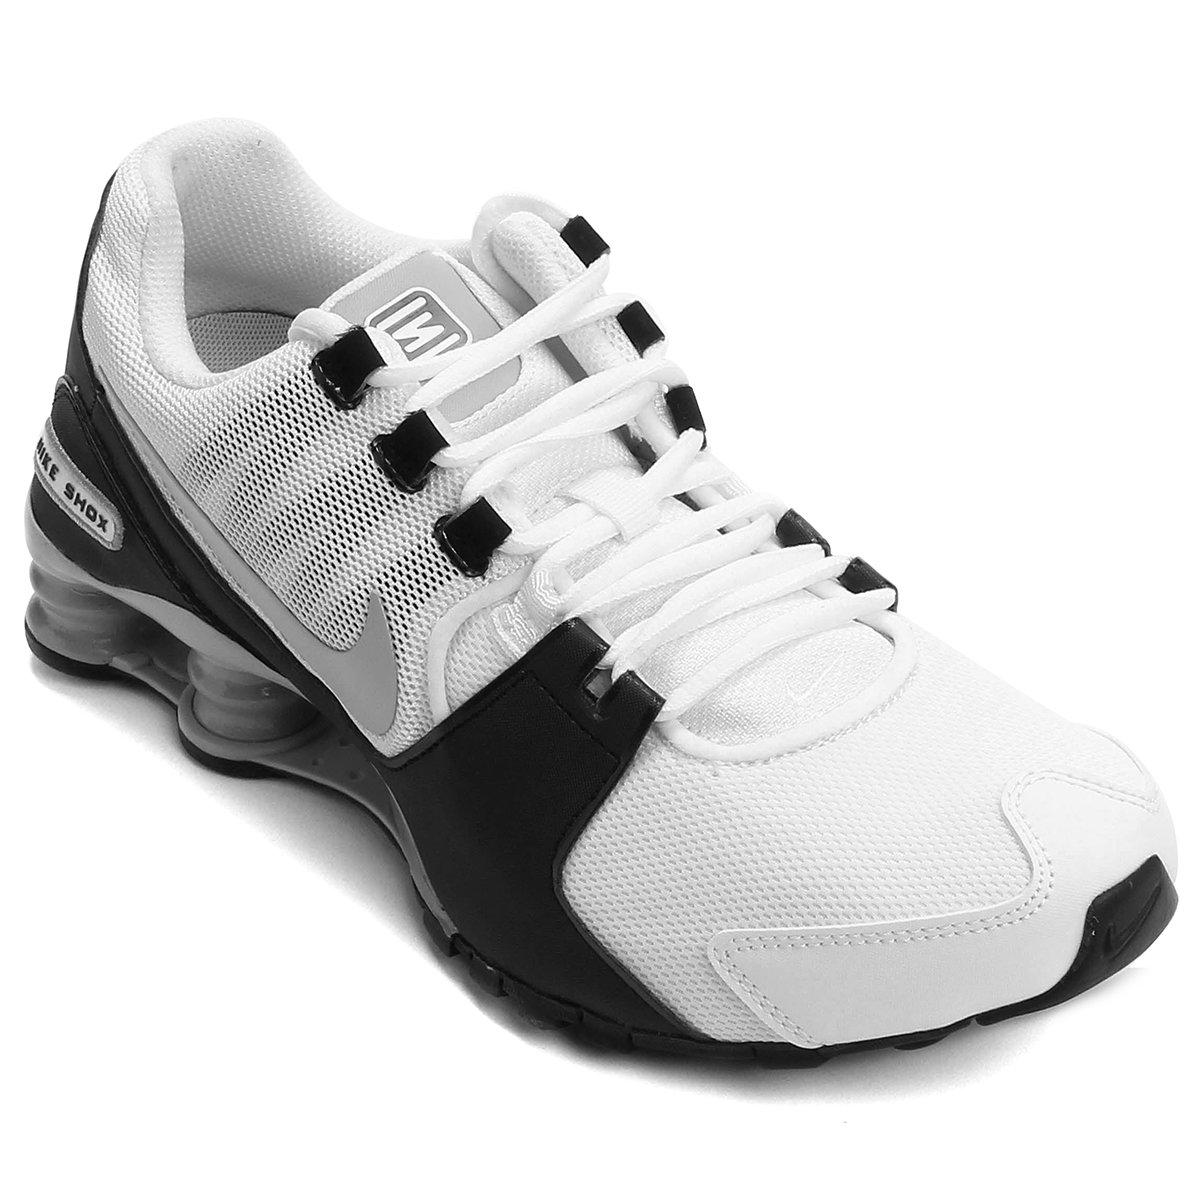 Tênis Nike Shox Avenue Masculino - Compre Agora  92ae34a1c1643